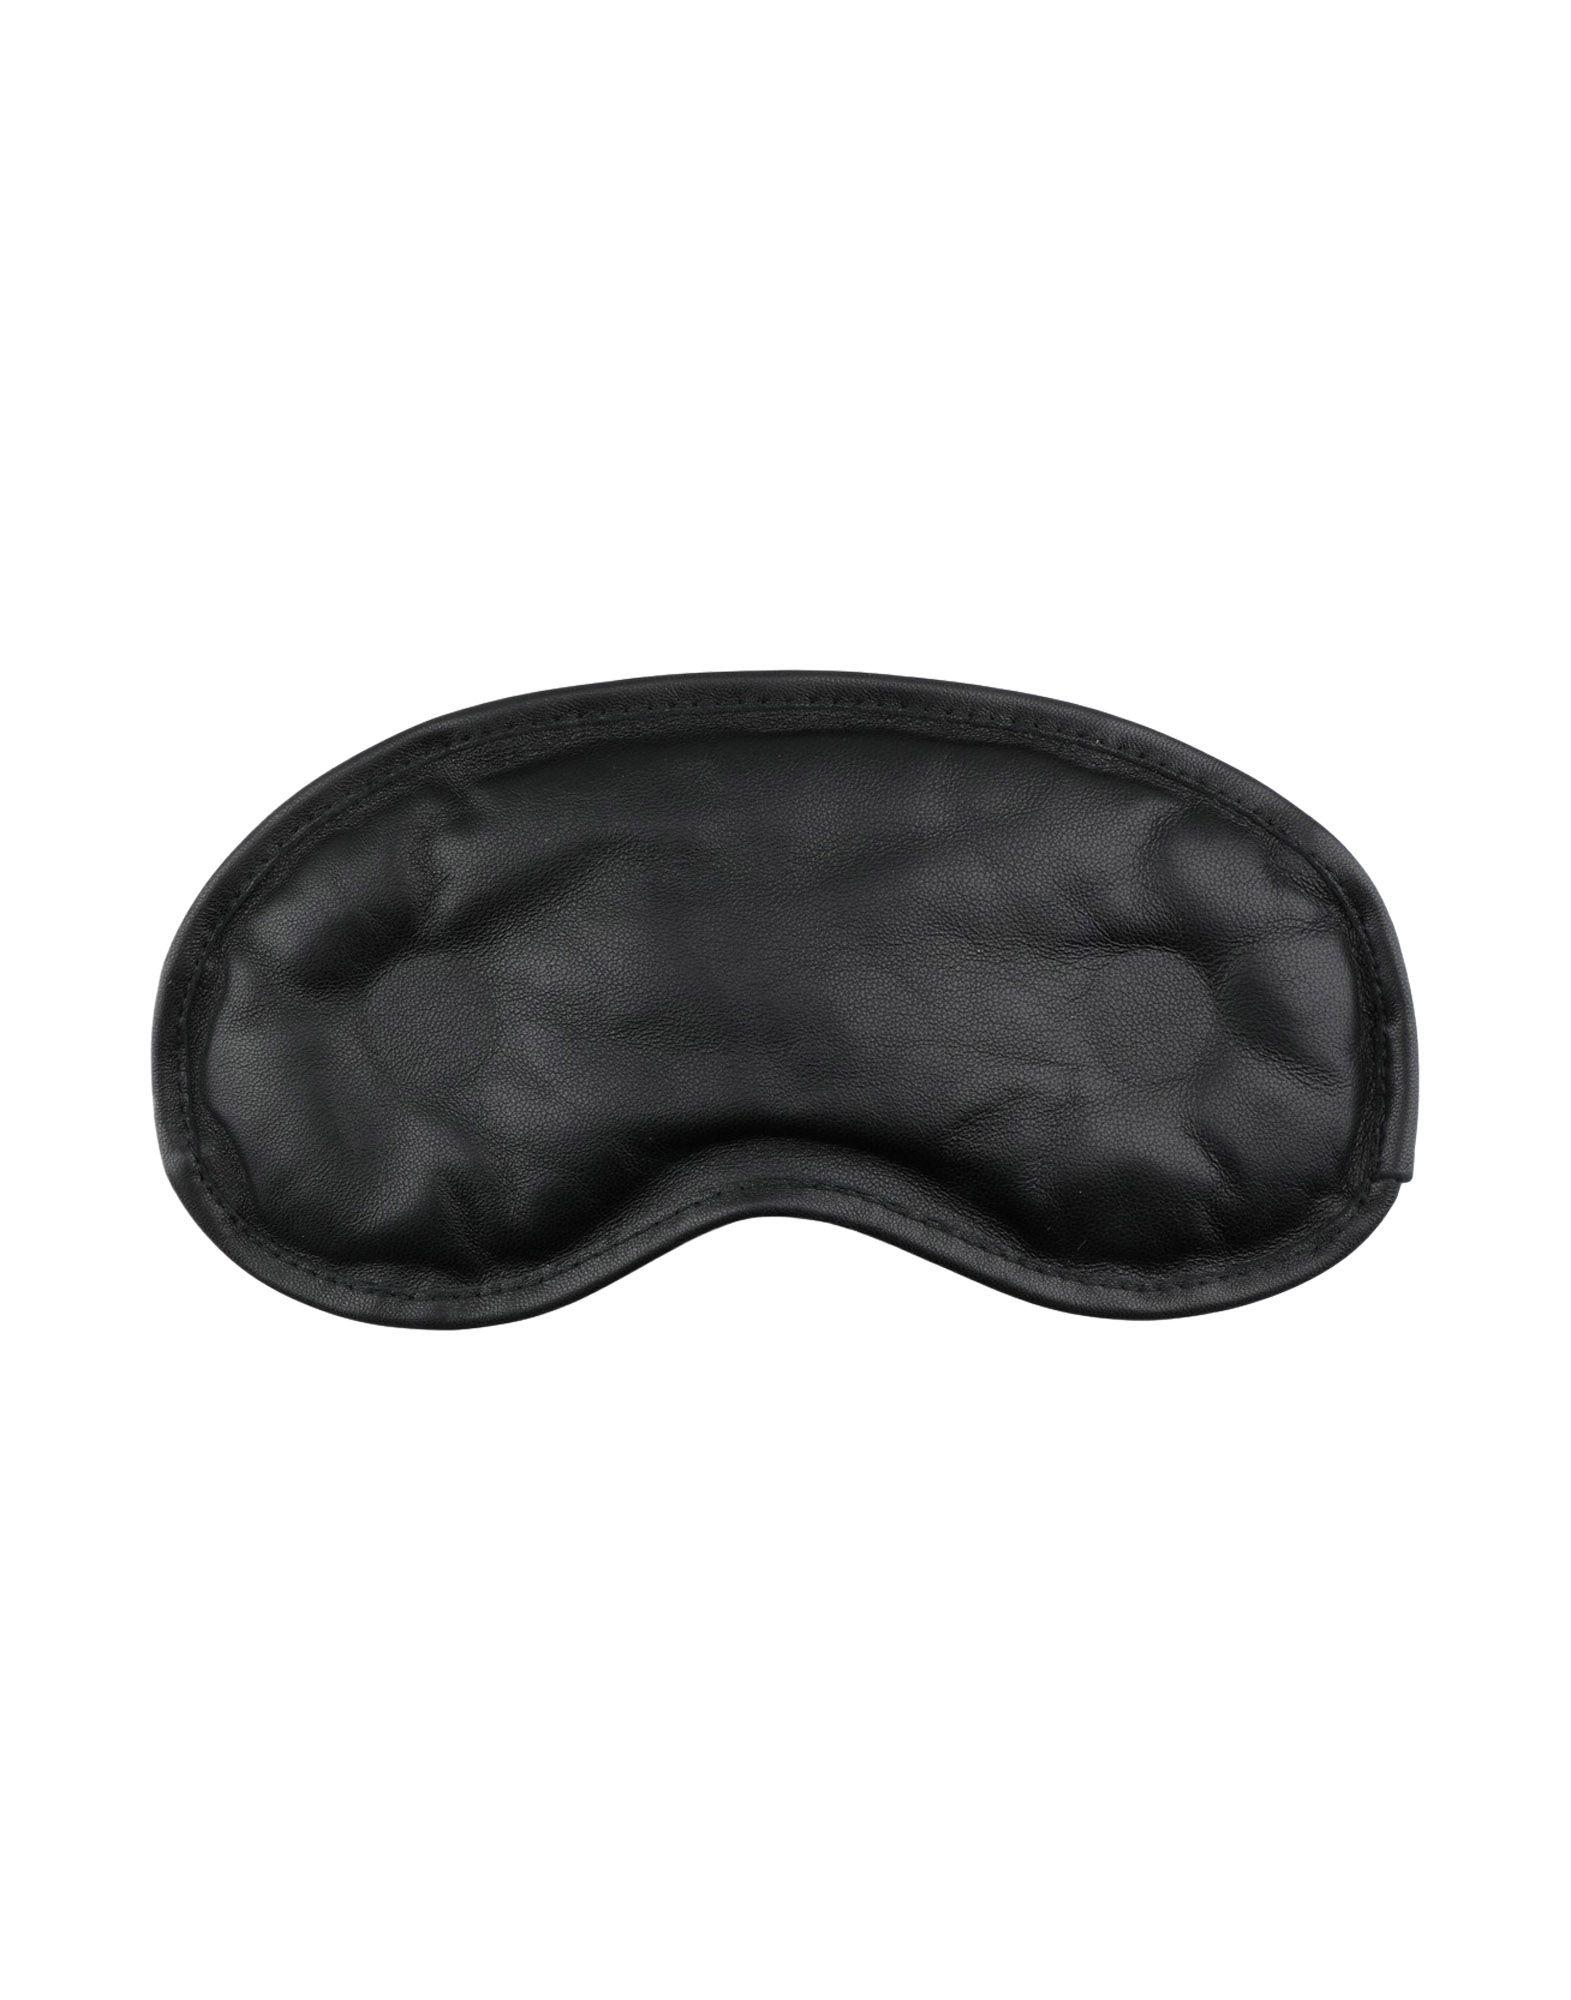 MAISON MARGIELA Eyemasks. nappa leather, no appliqués, solid color, contains non-textile parts of animal origin. 100% Ovine leather